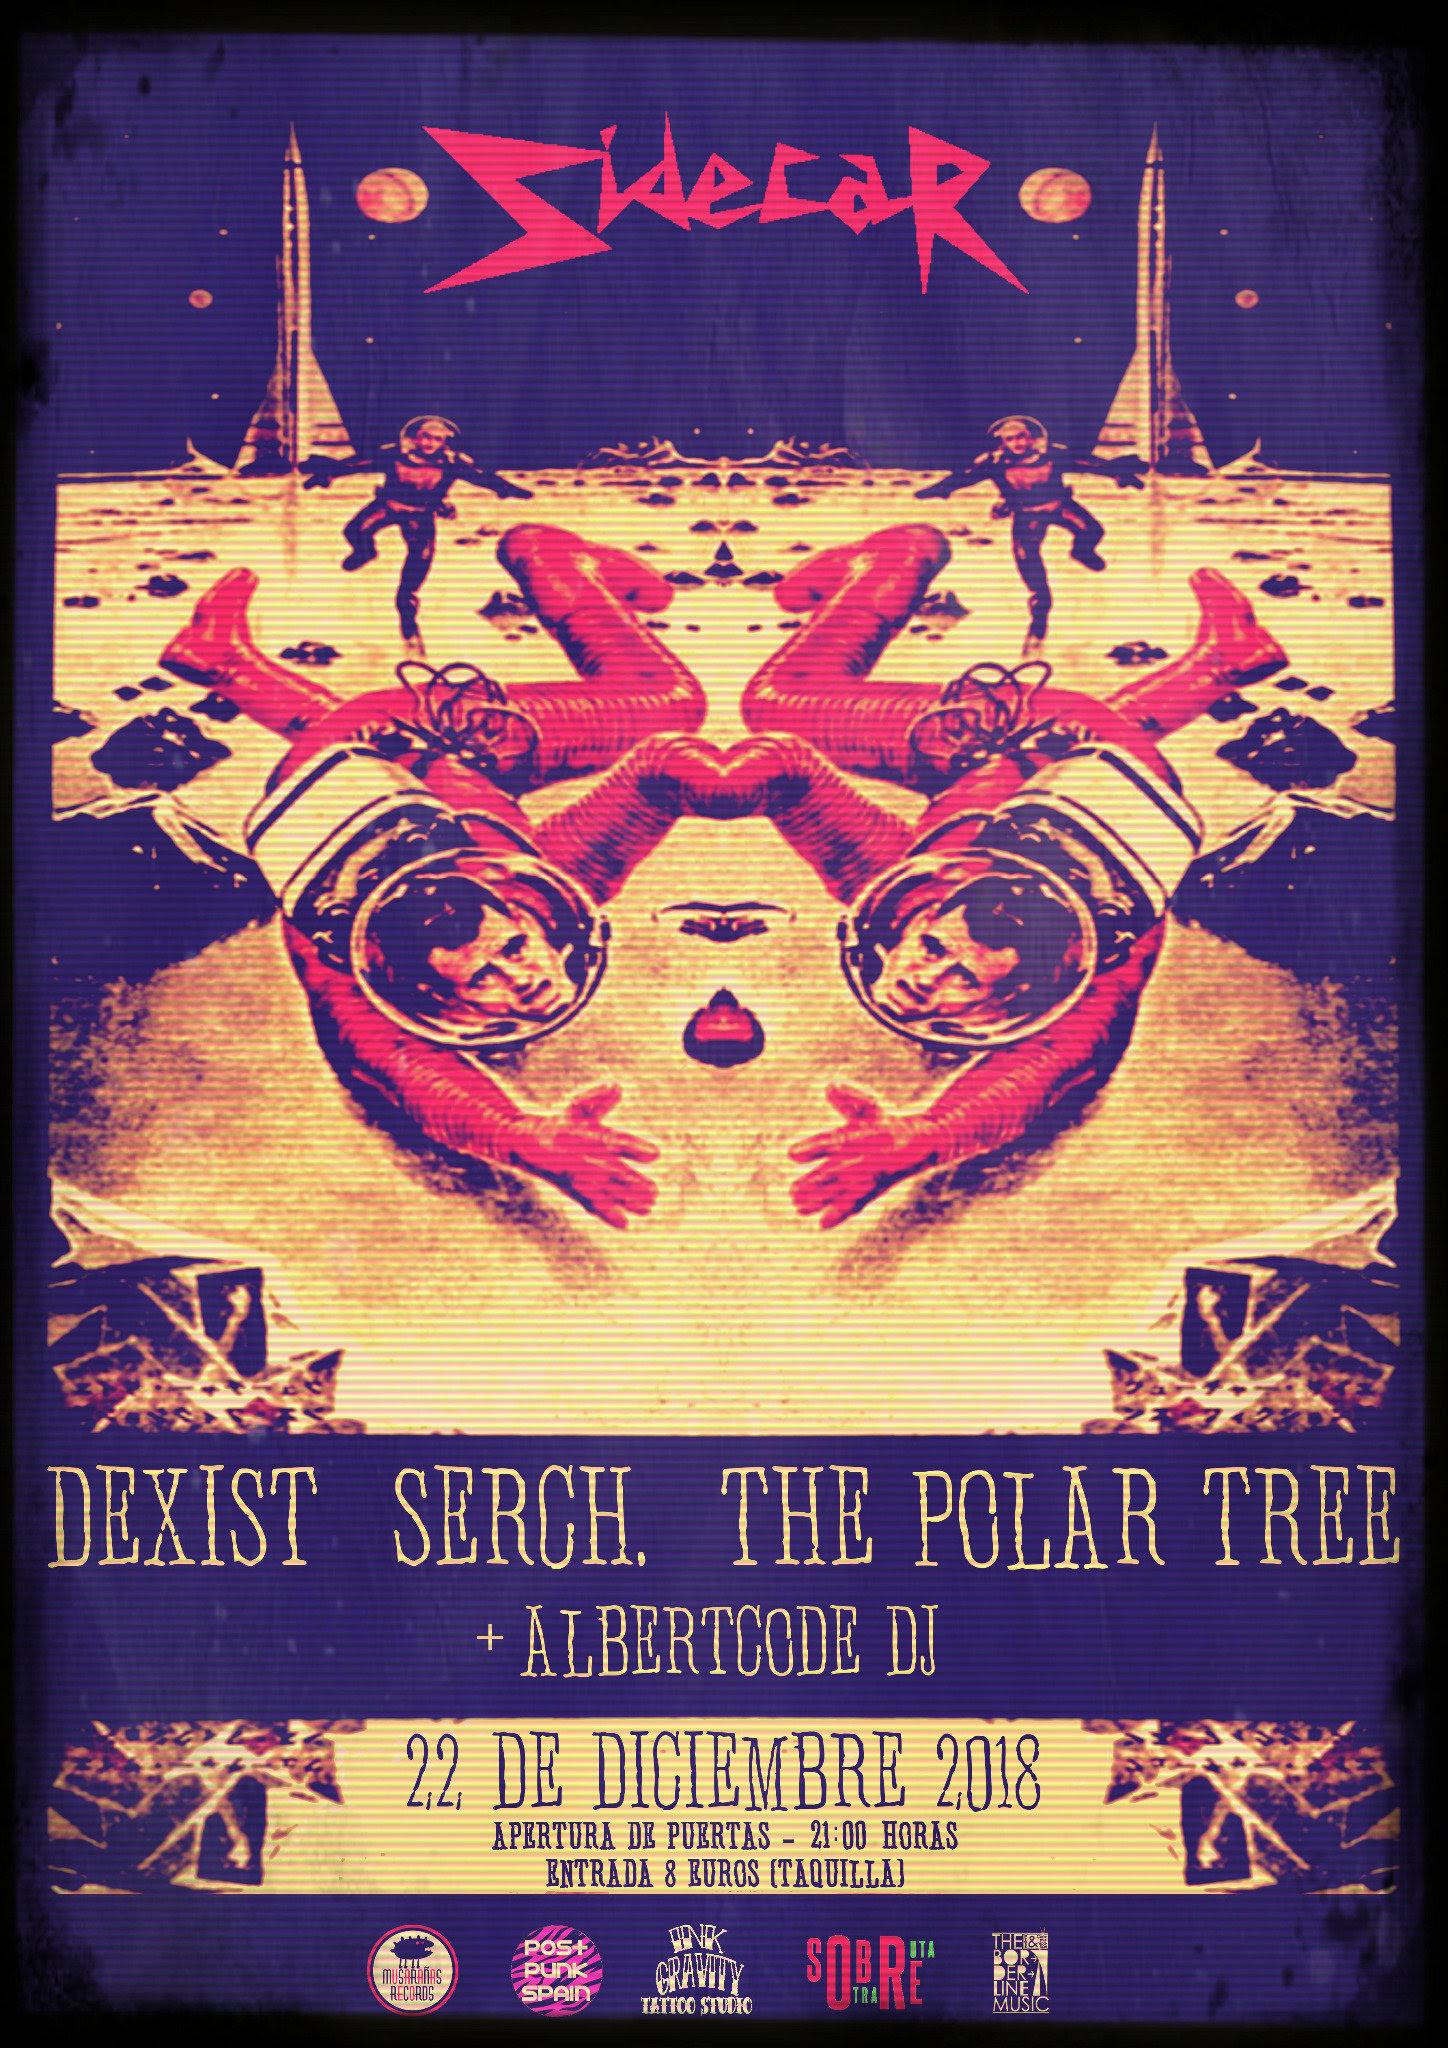 Dexist Serch. The Polar Tree Albertcode Dj Sala Sidecar · 22 de diciembre 2018 · Barcelona - 6